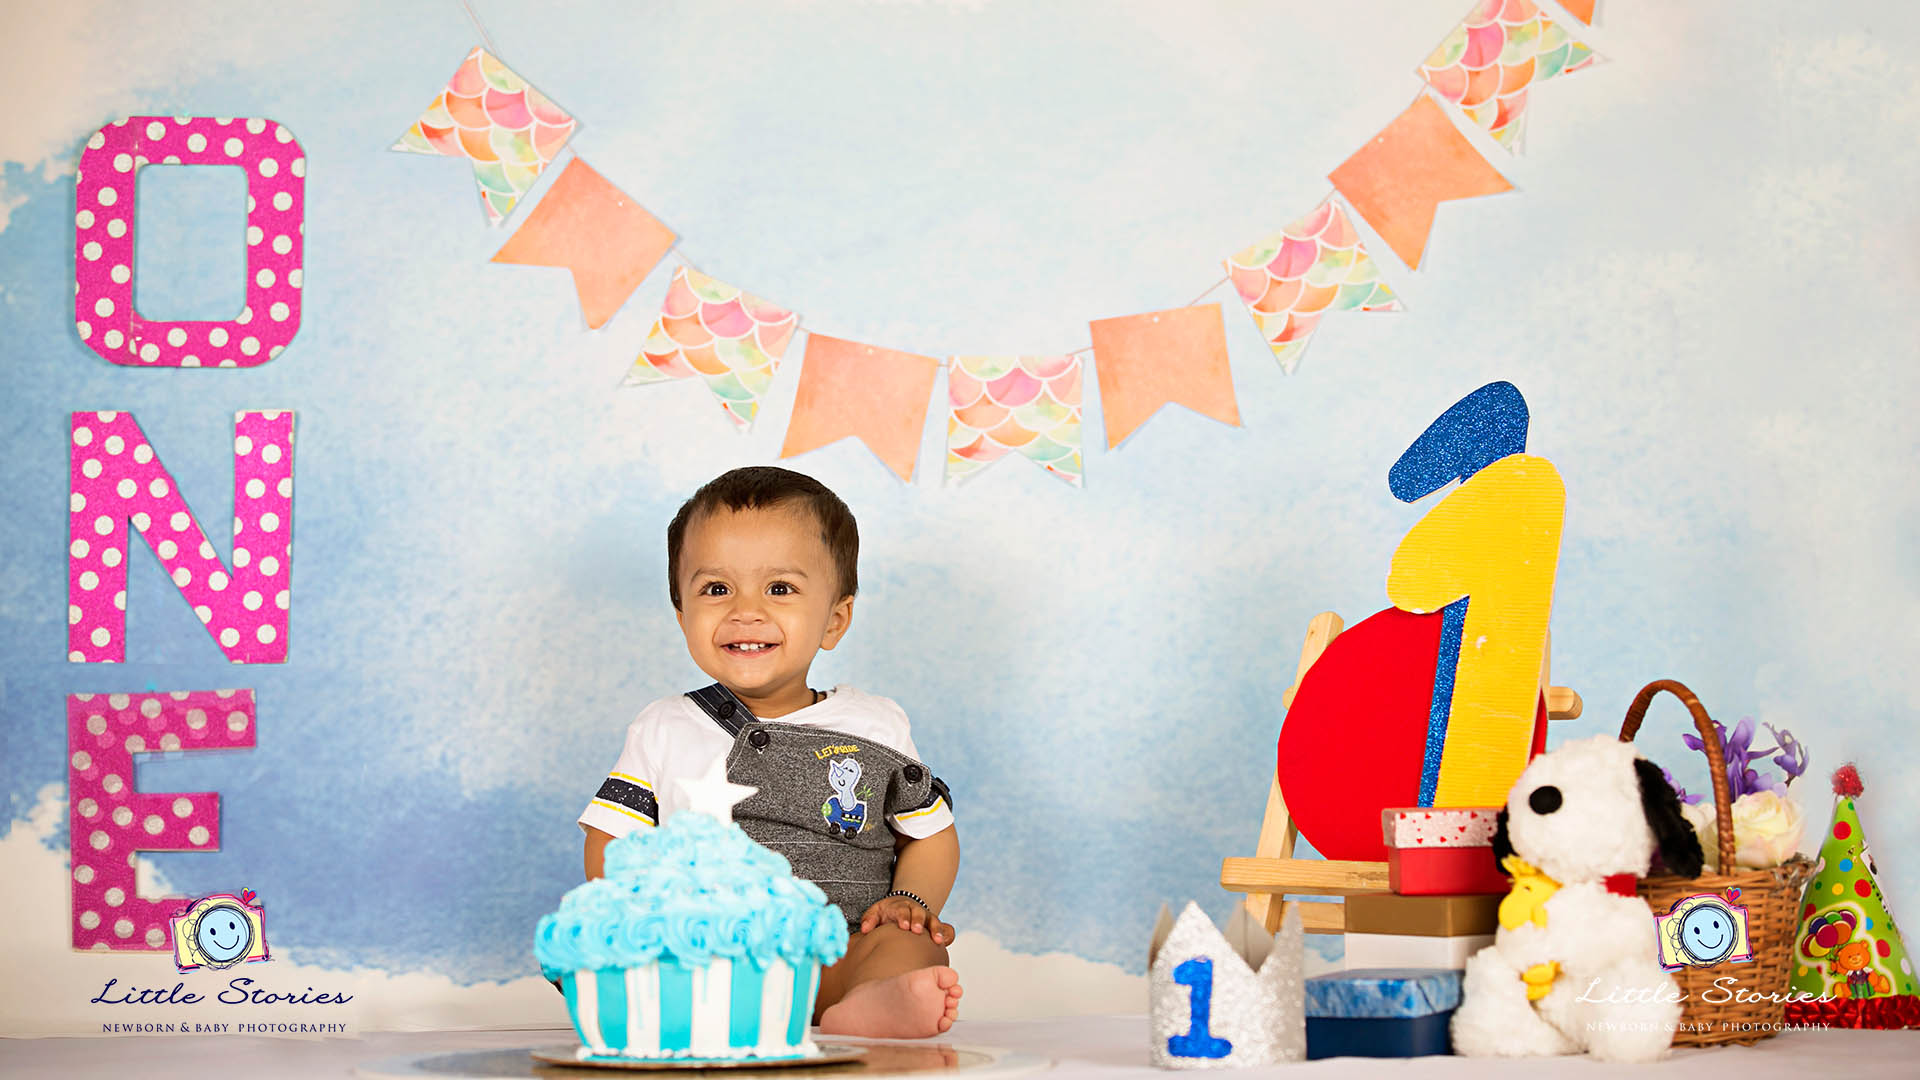 little-stories-kids-baby-photography-delhi-noida-gurgaon-work-41